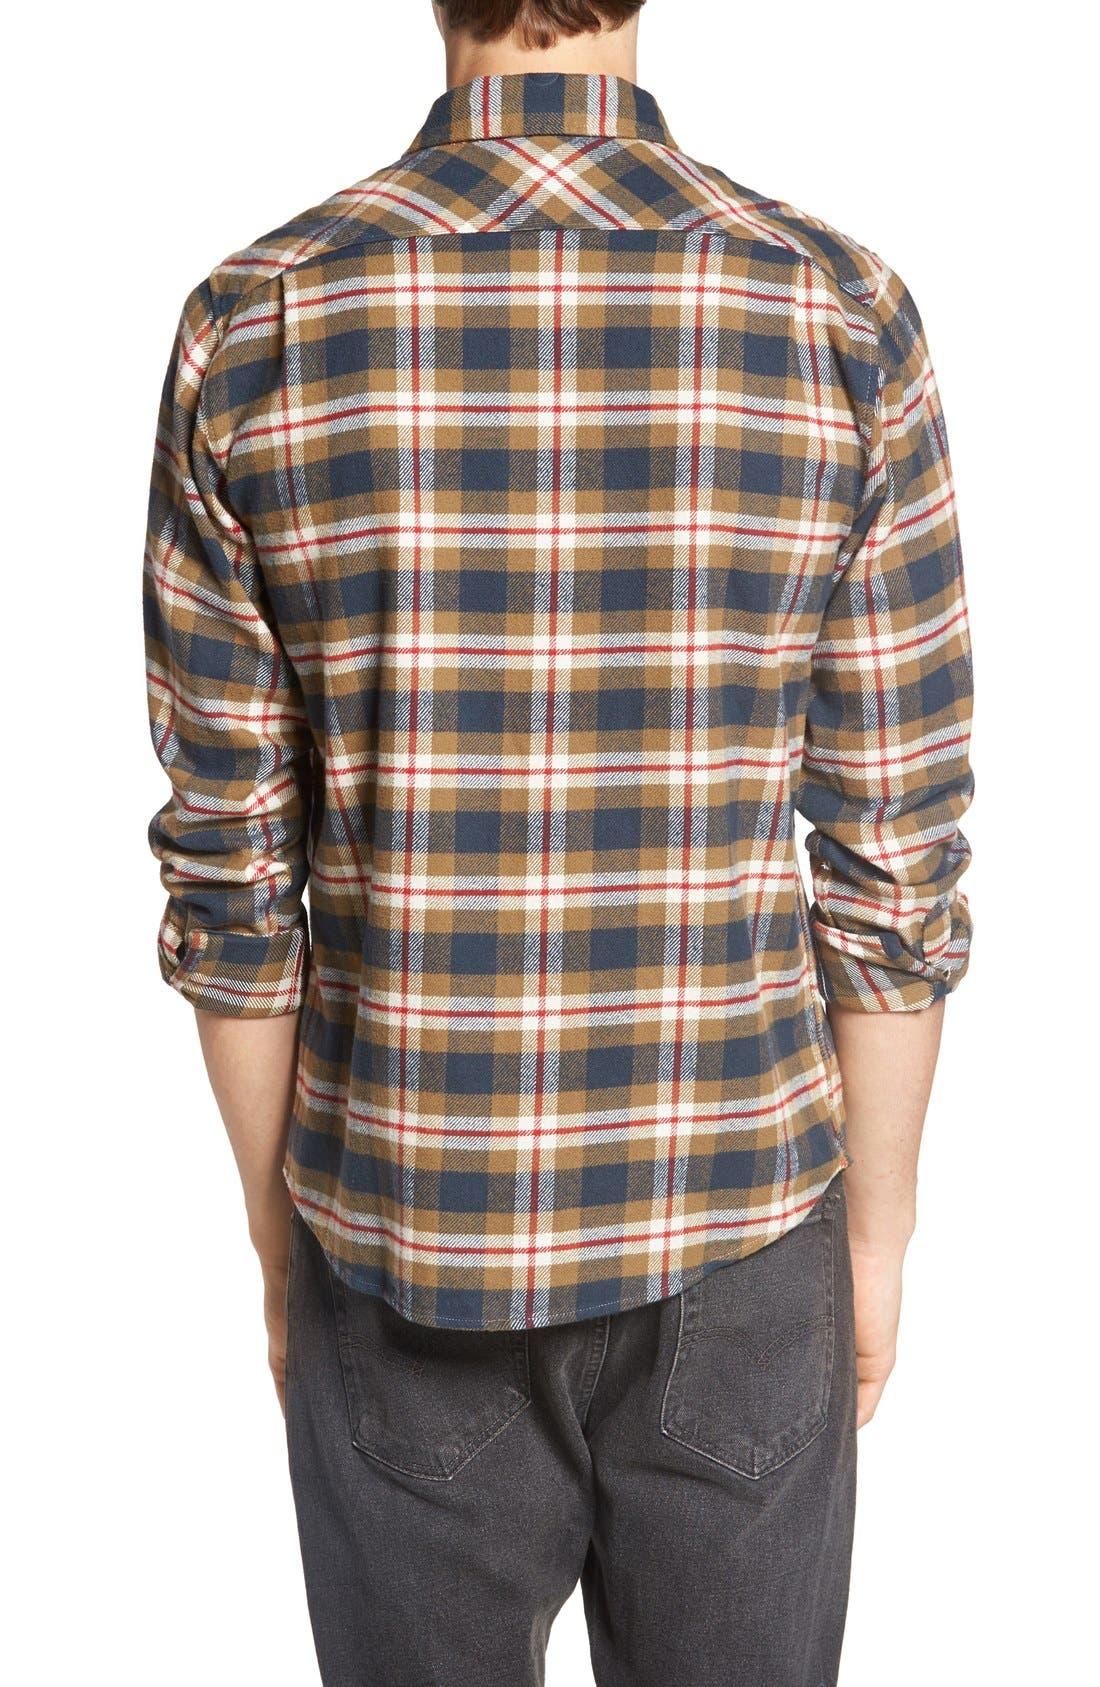 'That'll Work' Trim Fit Plaid Flannel Shirt,                             Alternate thumbnail 27, color,